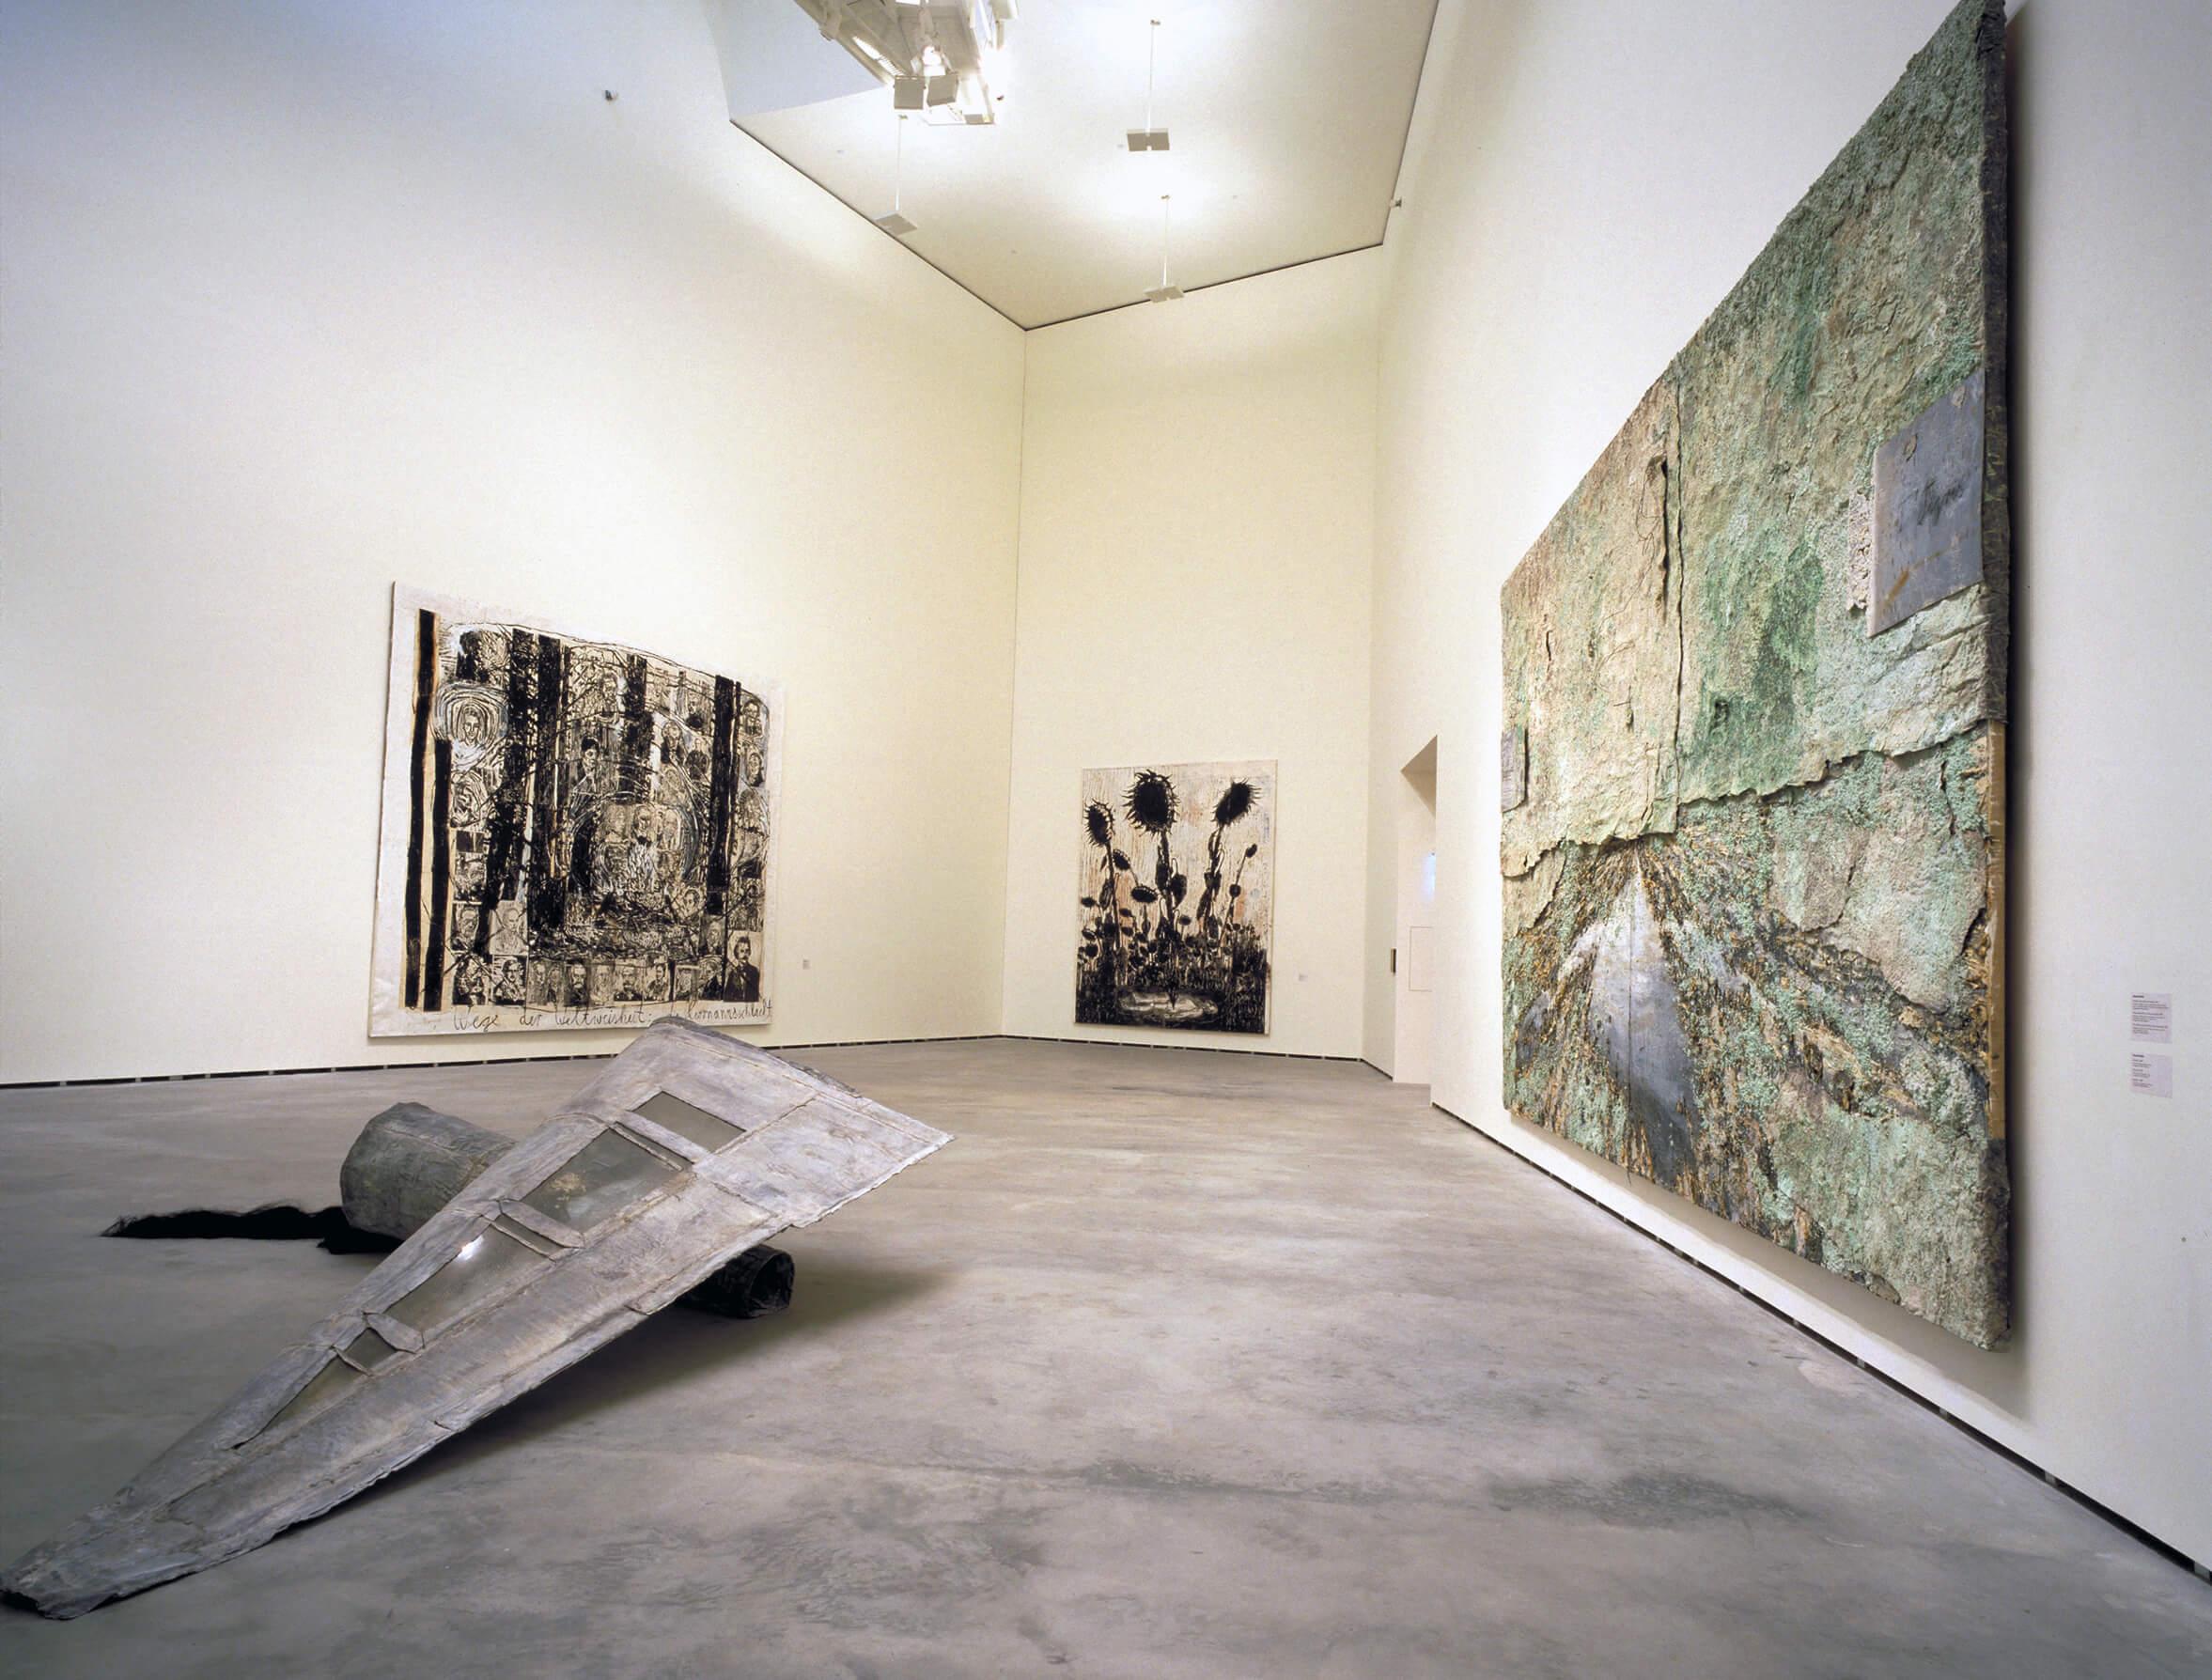 Bi ibaien lurra | Anselm Kiefer | Guggenheim Bilbao Museoa